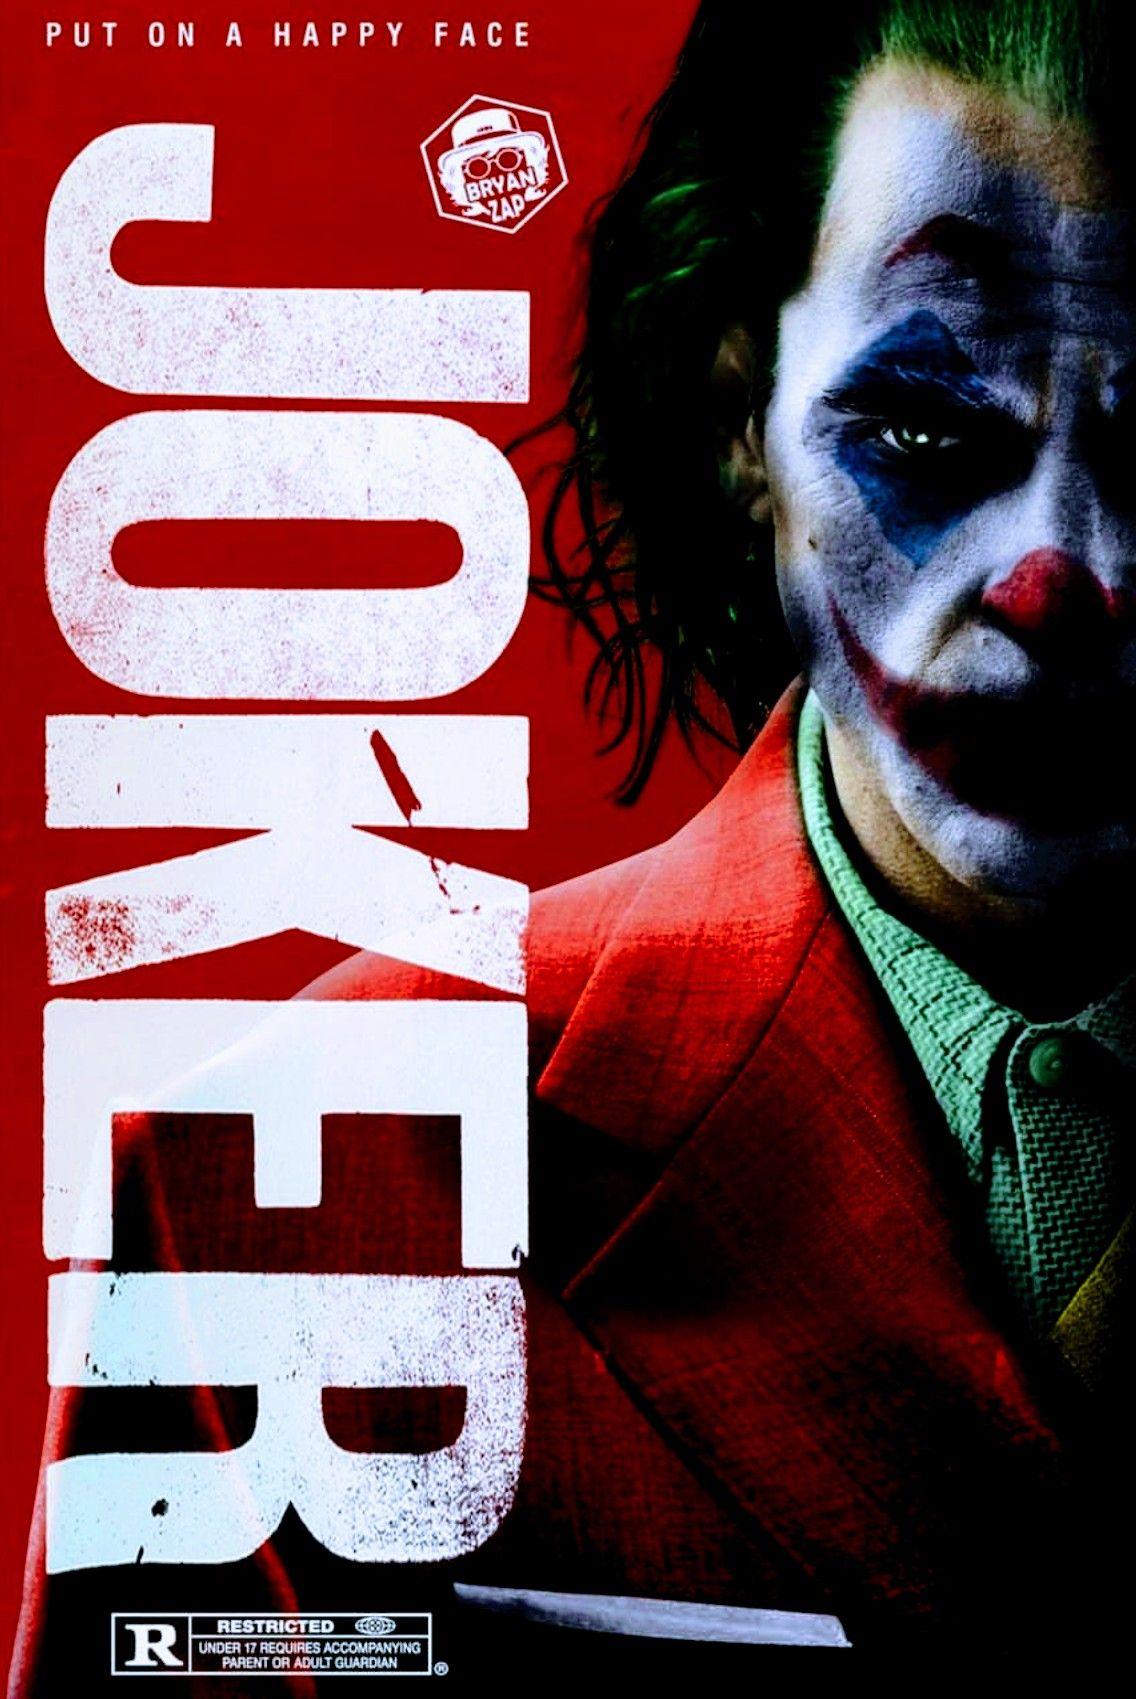 Joker, Joaquin Phoenix Joker, Joker full movie, Alone in